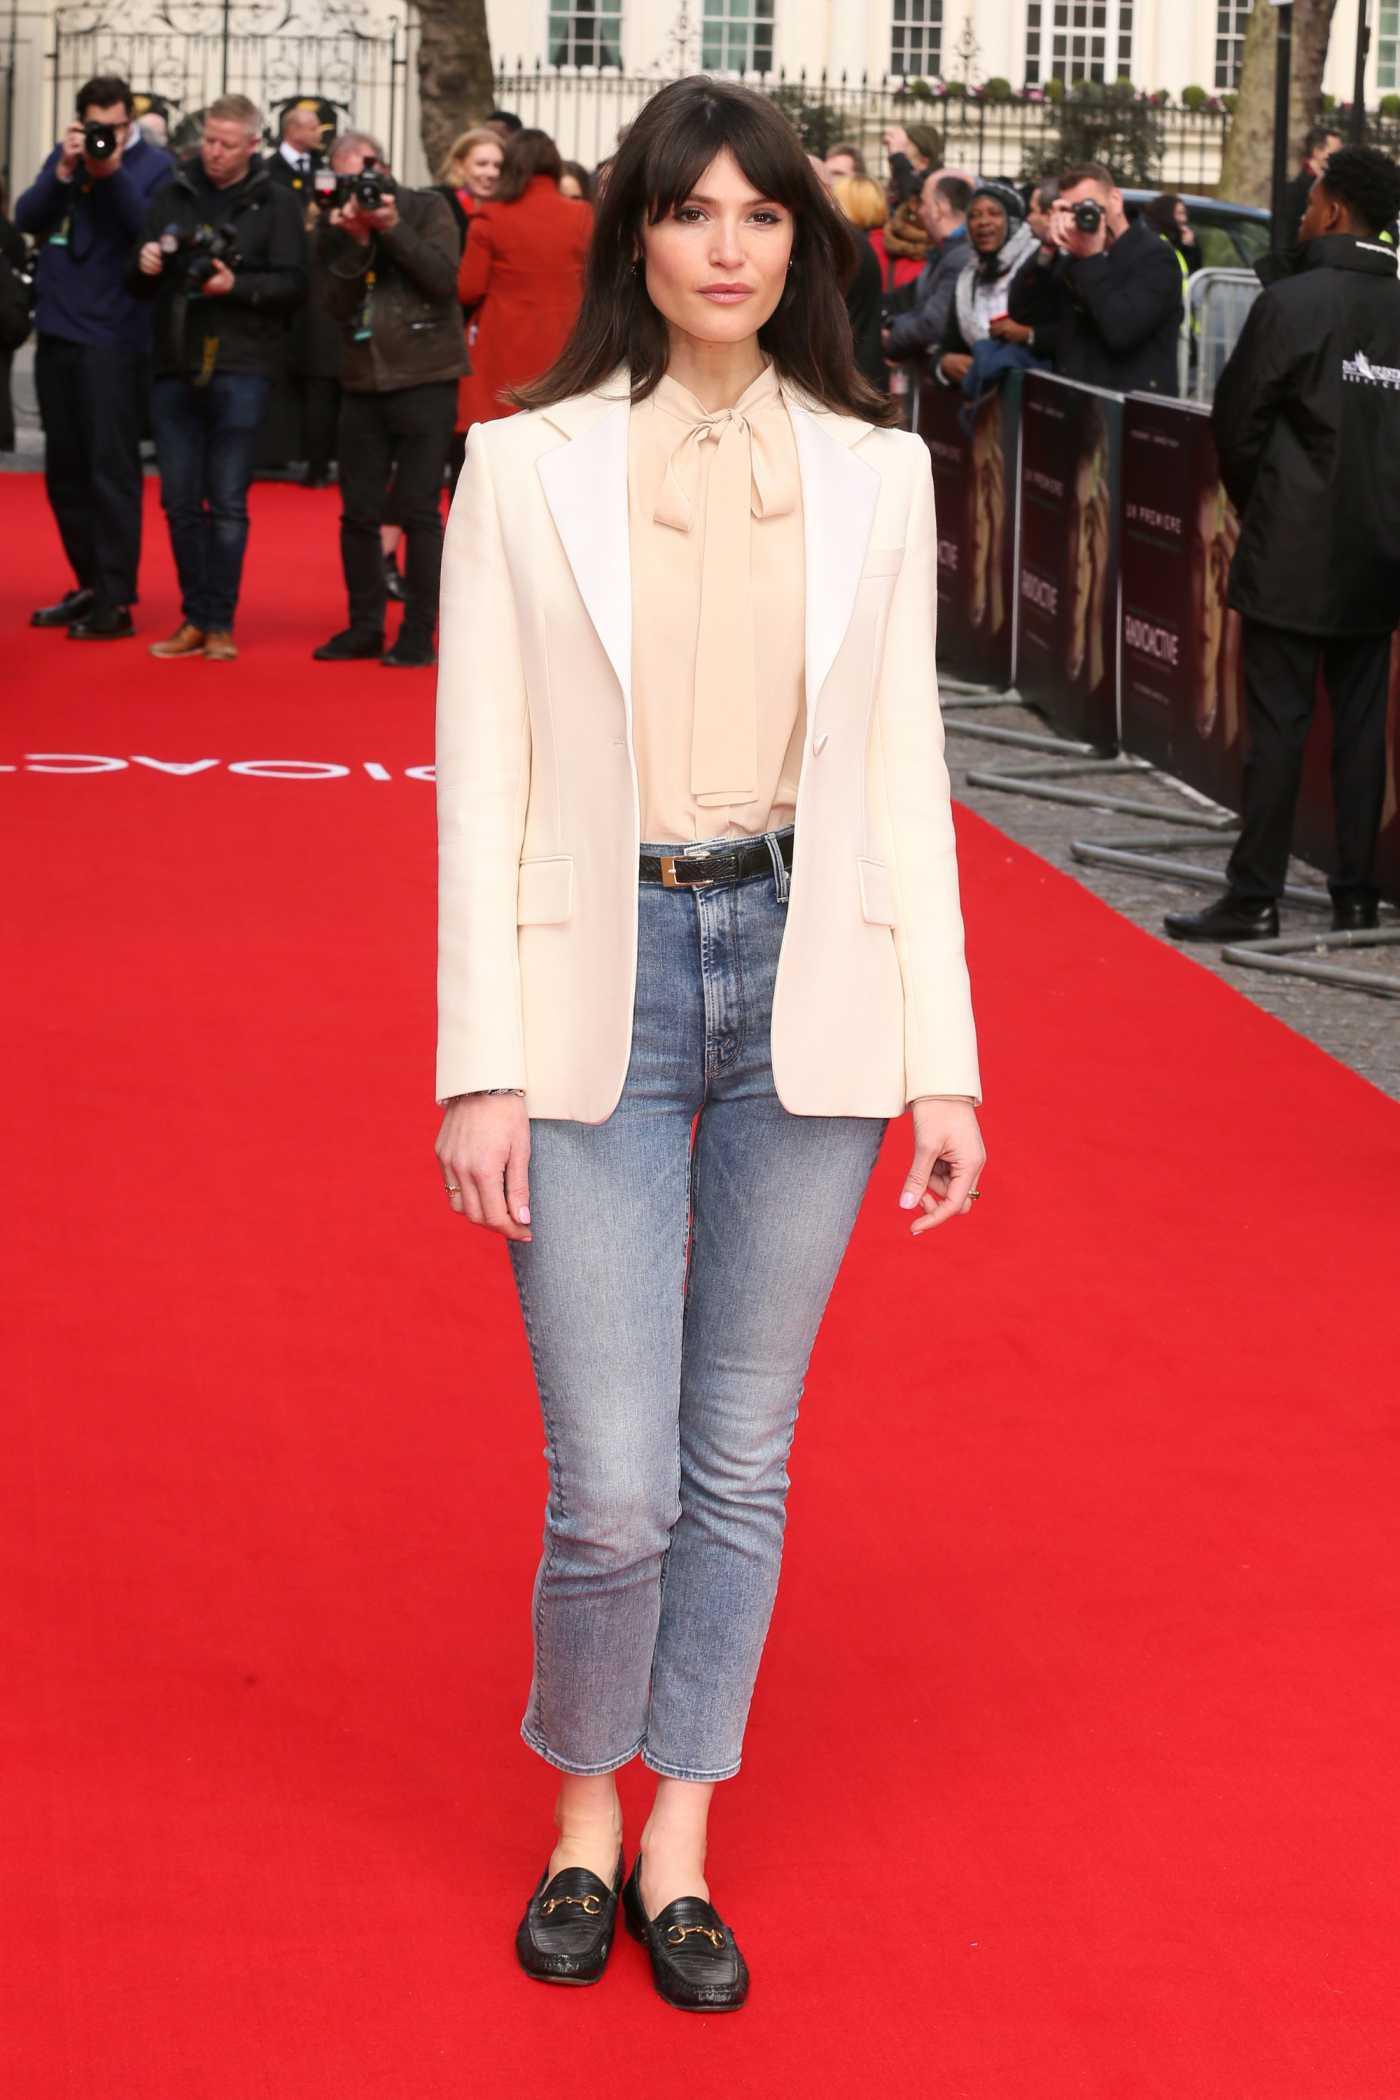 Gemma Arterton Attends the Radioactive Premiere in London 03/08/2020